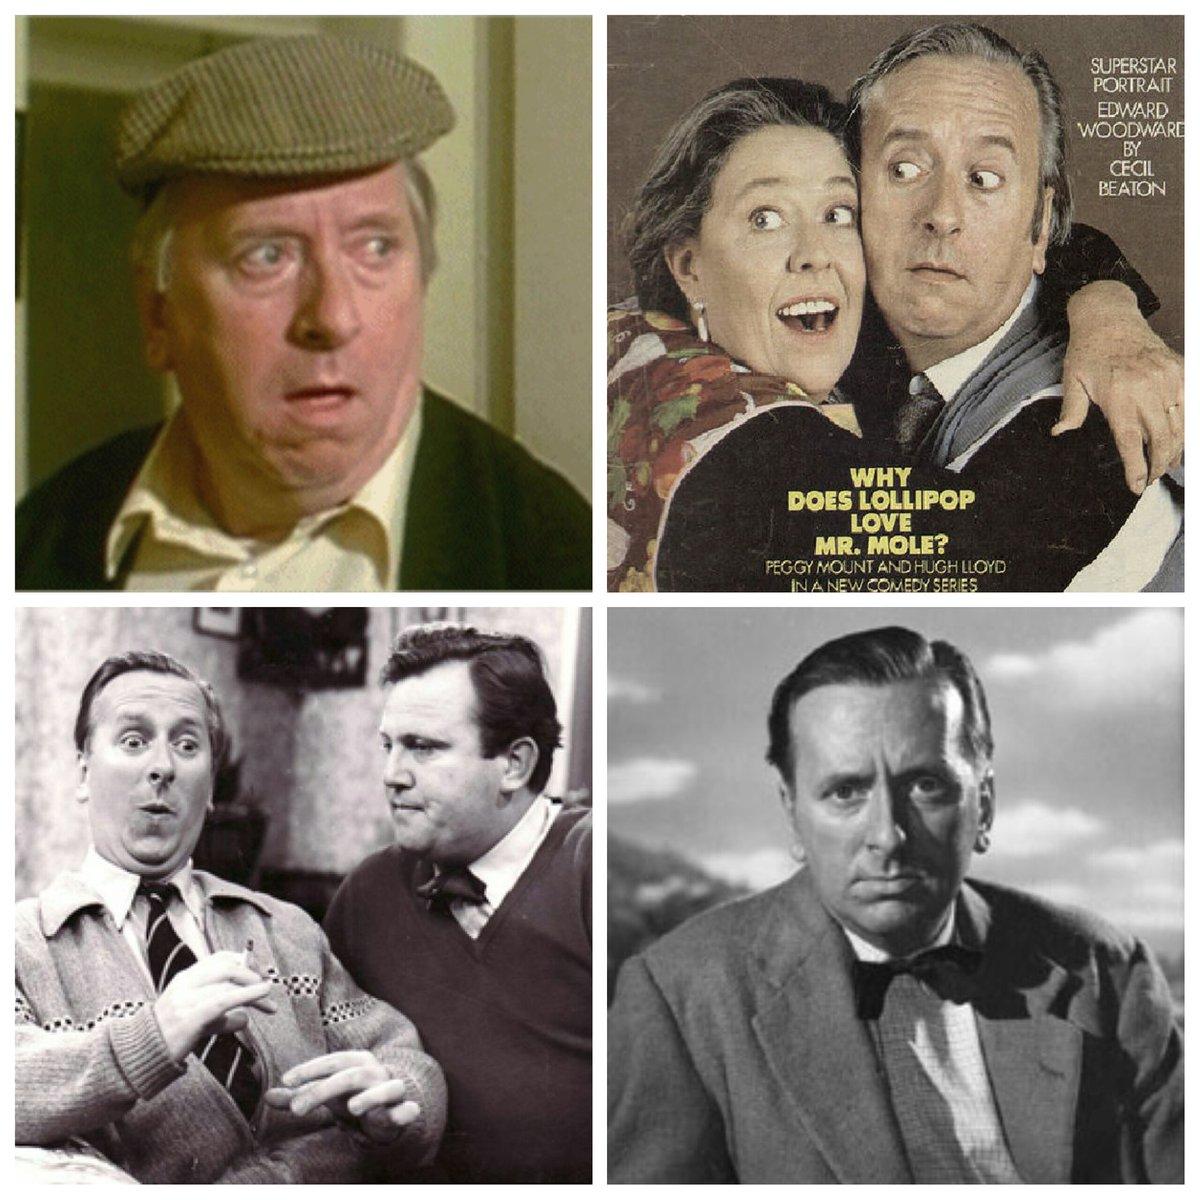 Remembering the late Actor, Hugh Lloyd,...